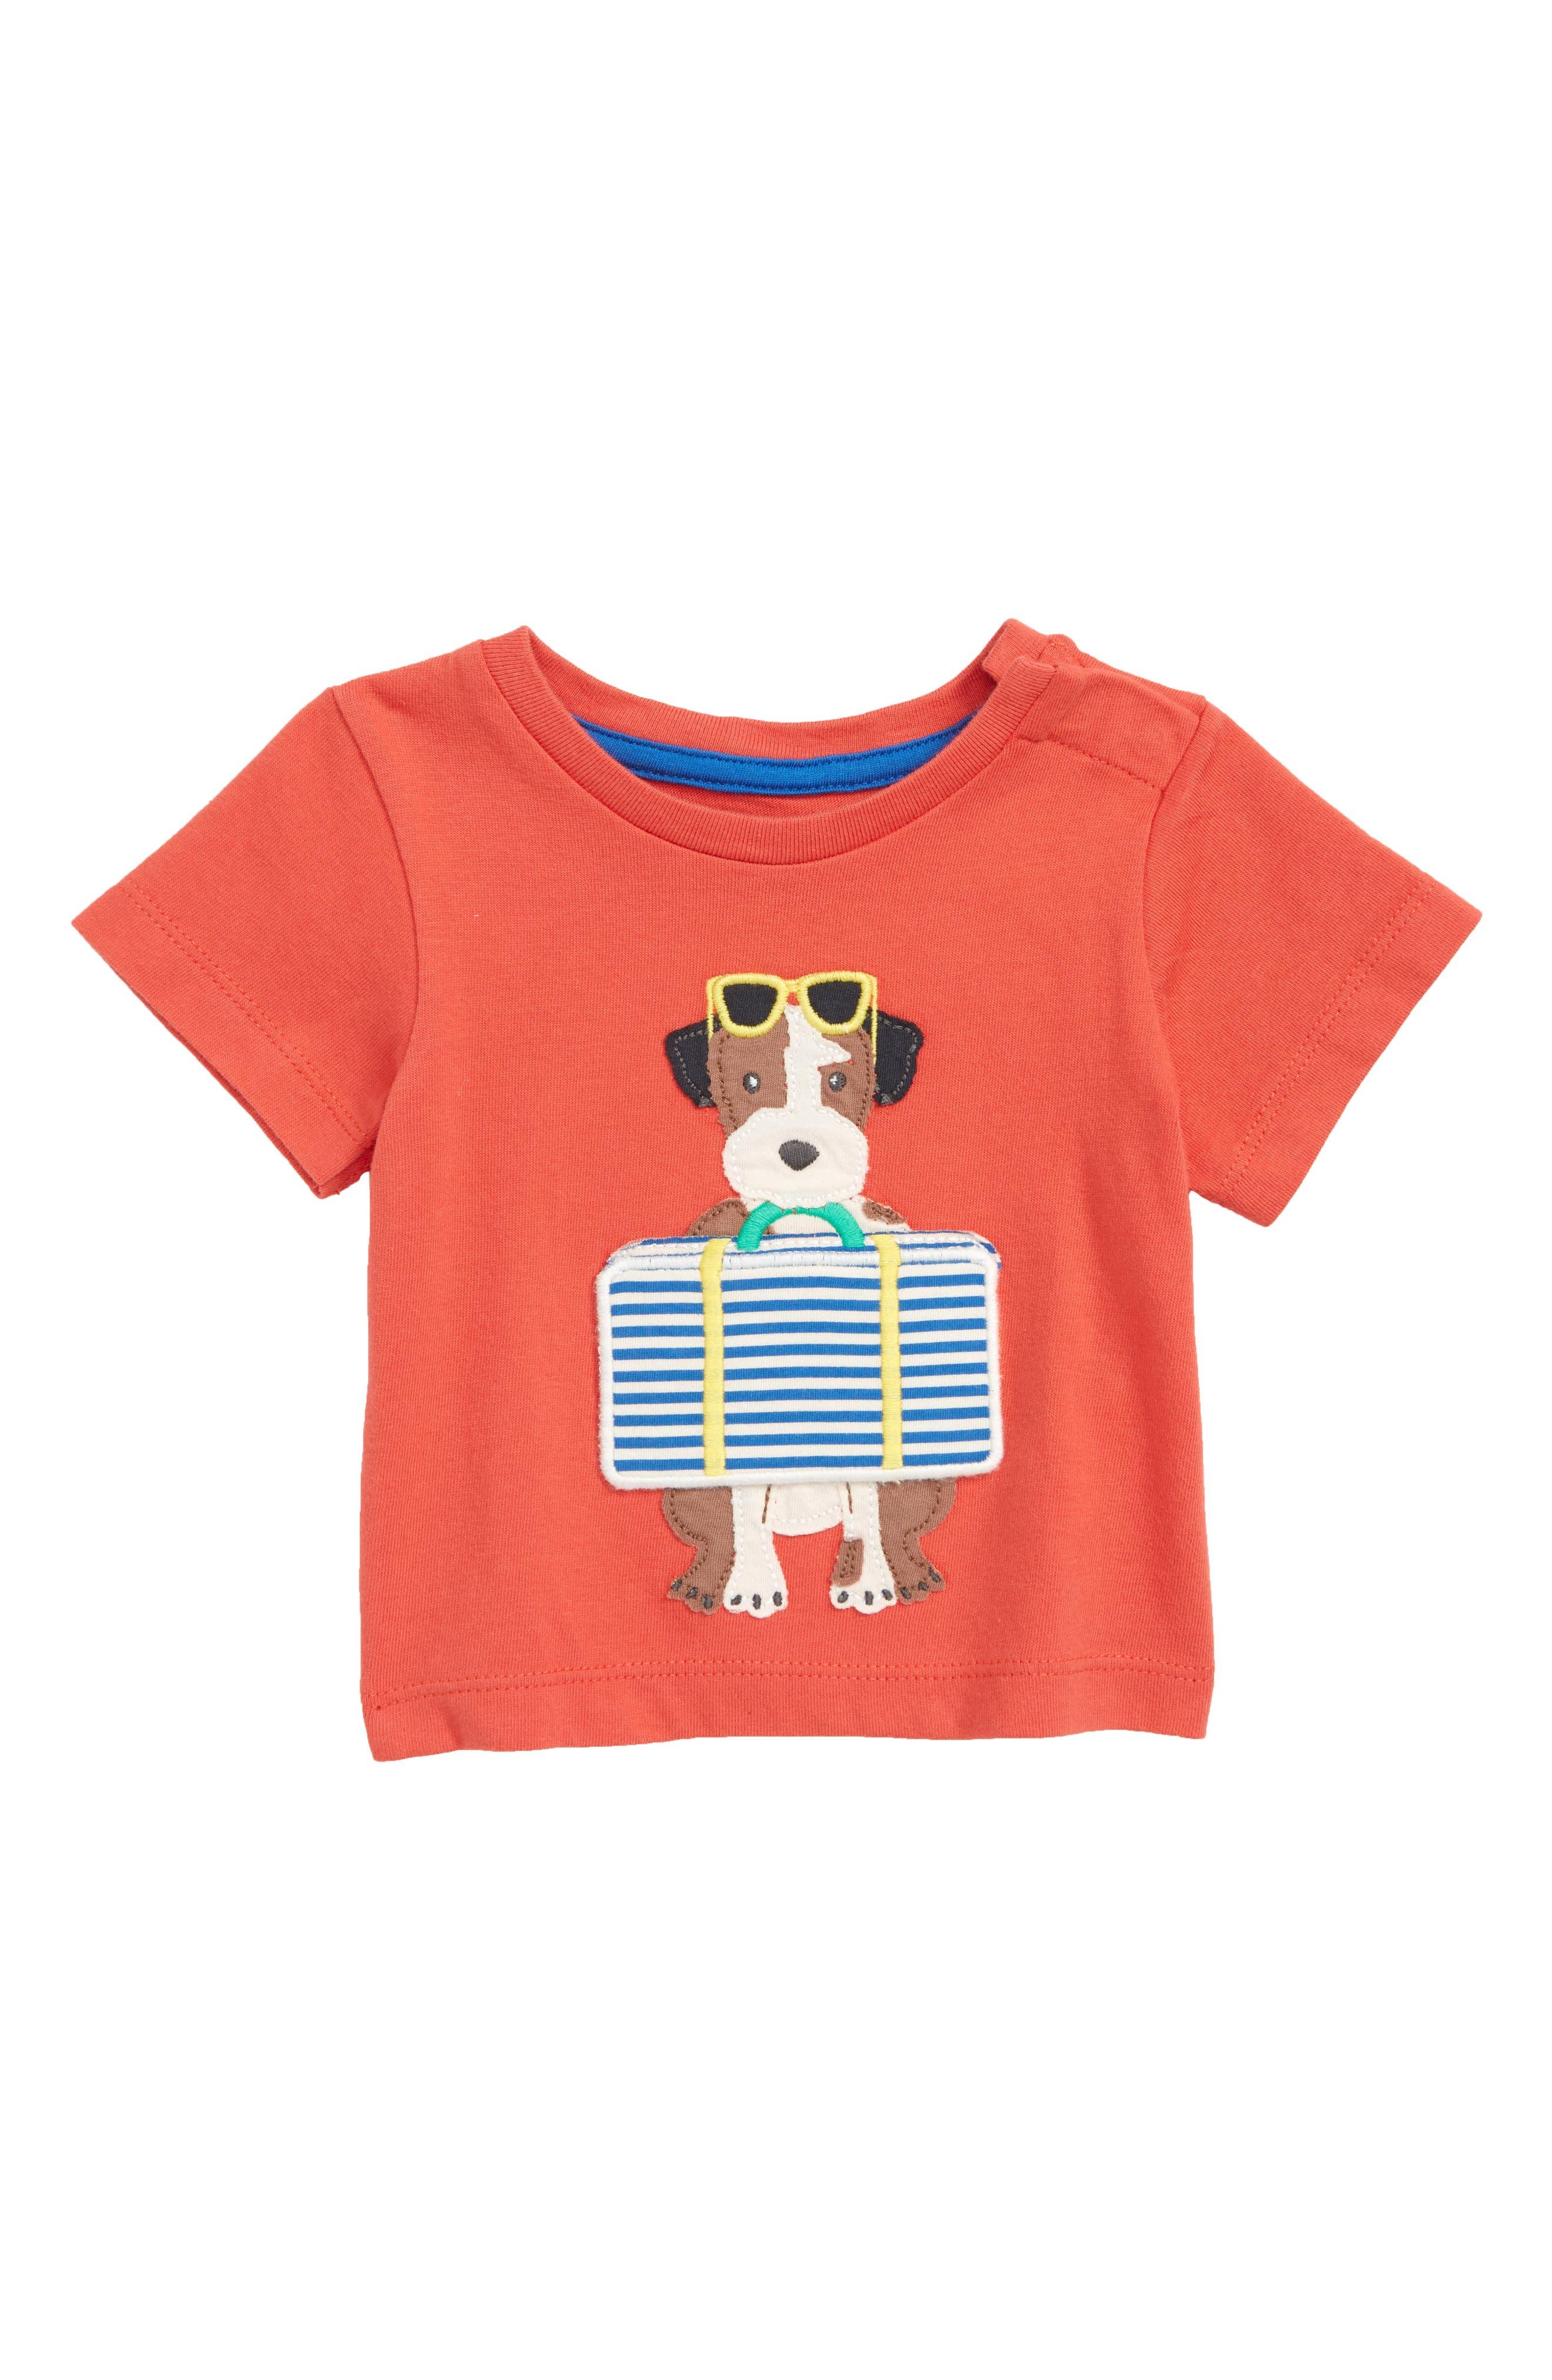 MINI BODEN,                             Peekaboo T-Shirt,                             Main thumbnail 1, color,                             614